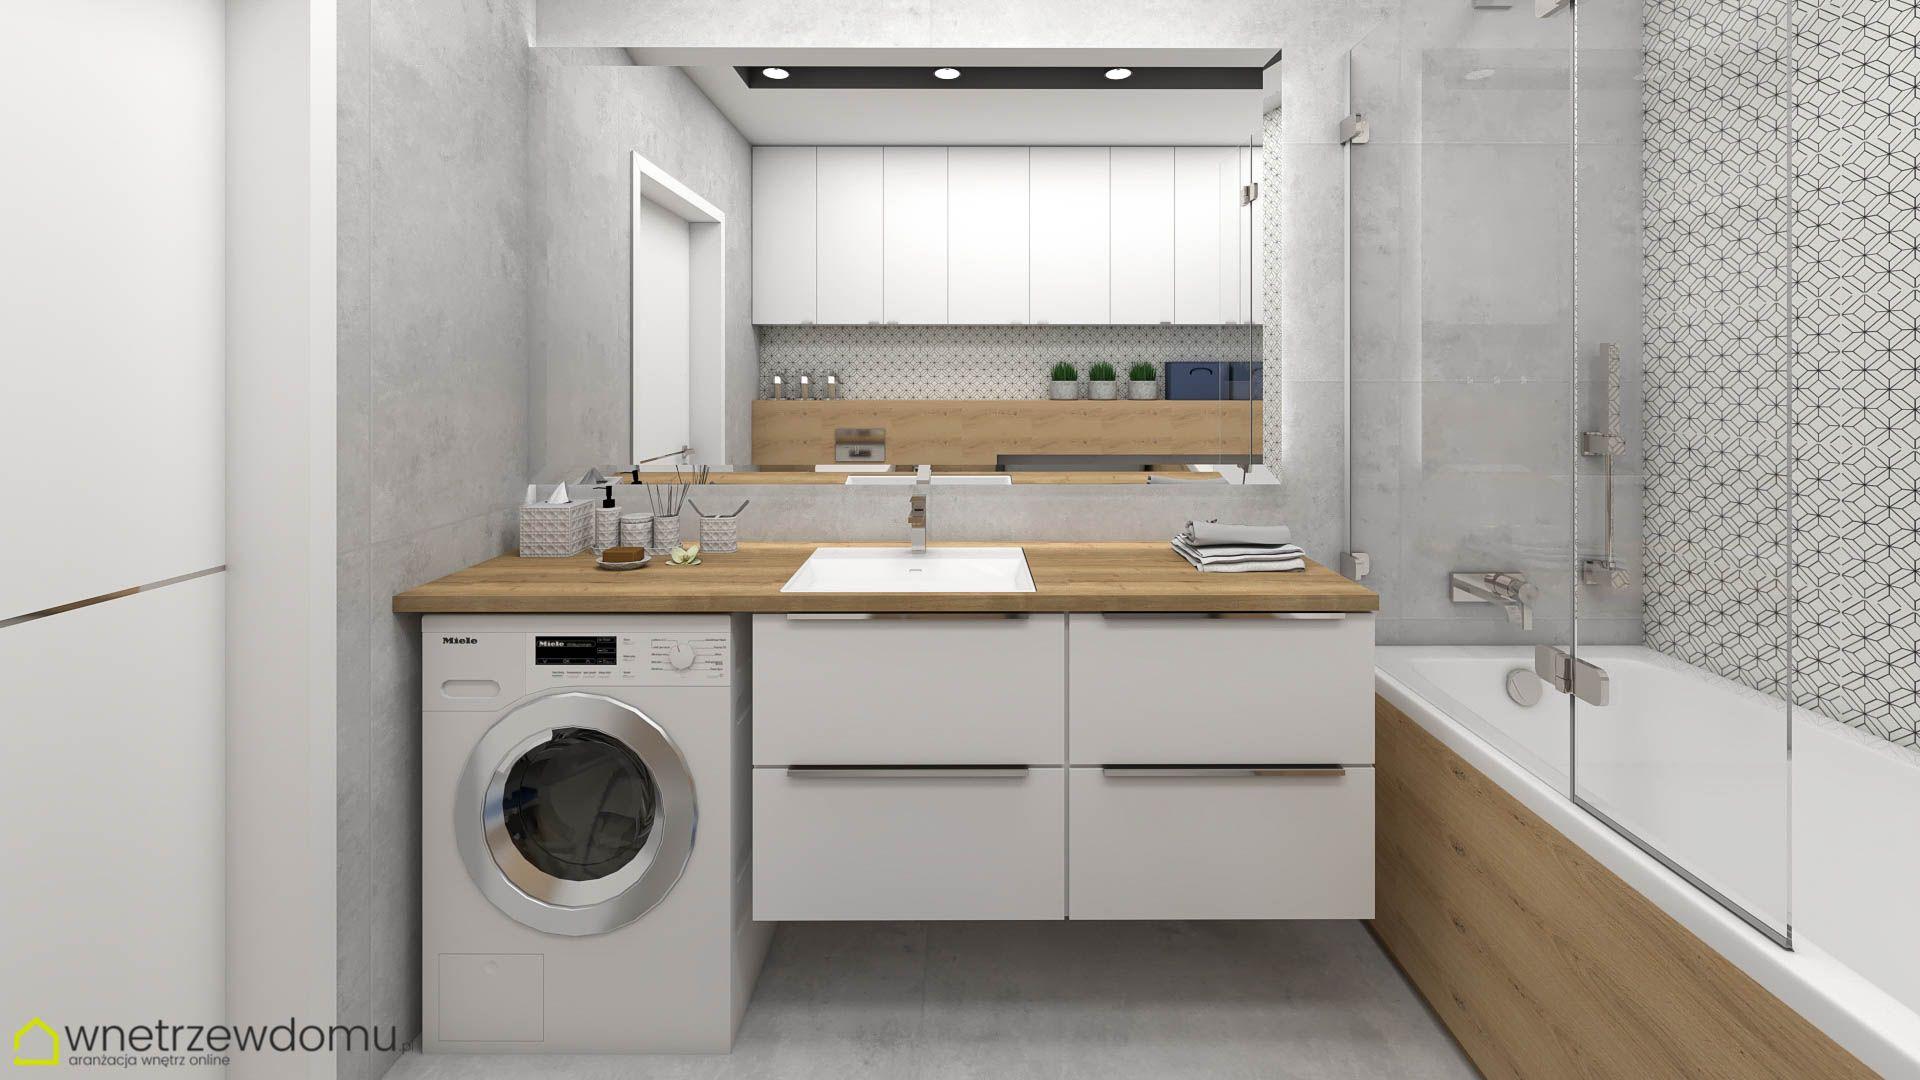 Lazienka Biel I Drewno Bathroom Design Small Bathroom Design Home Appliances